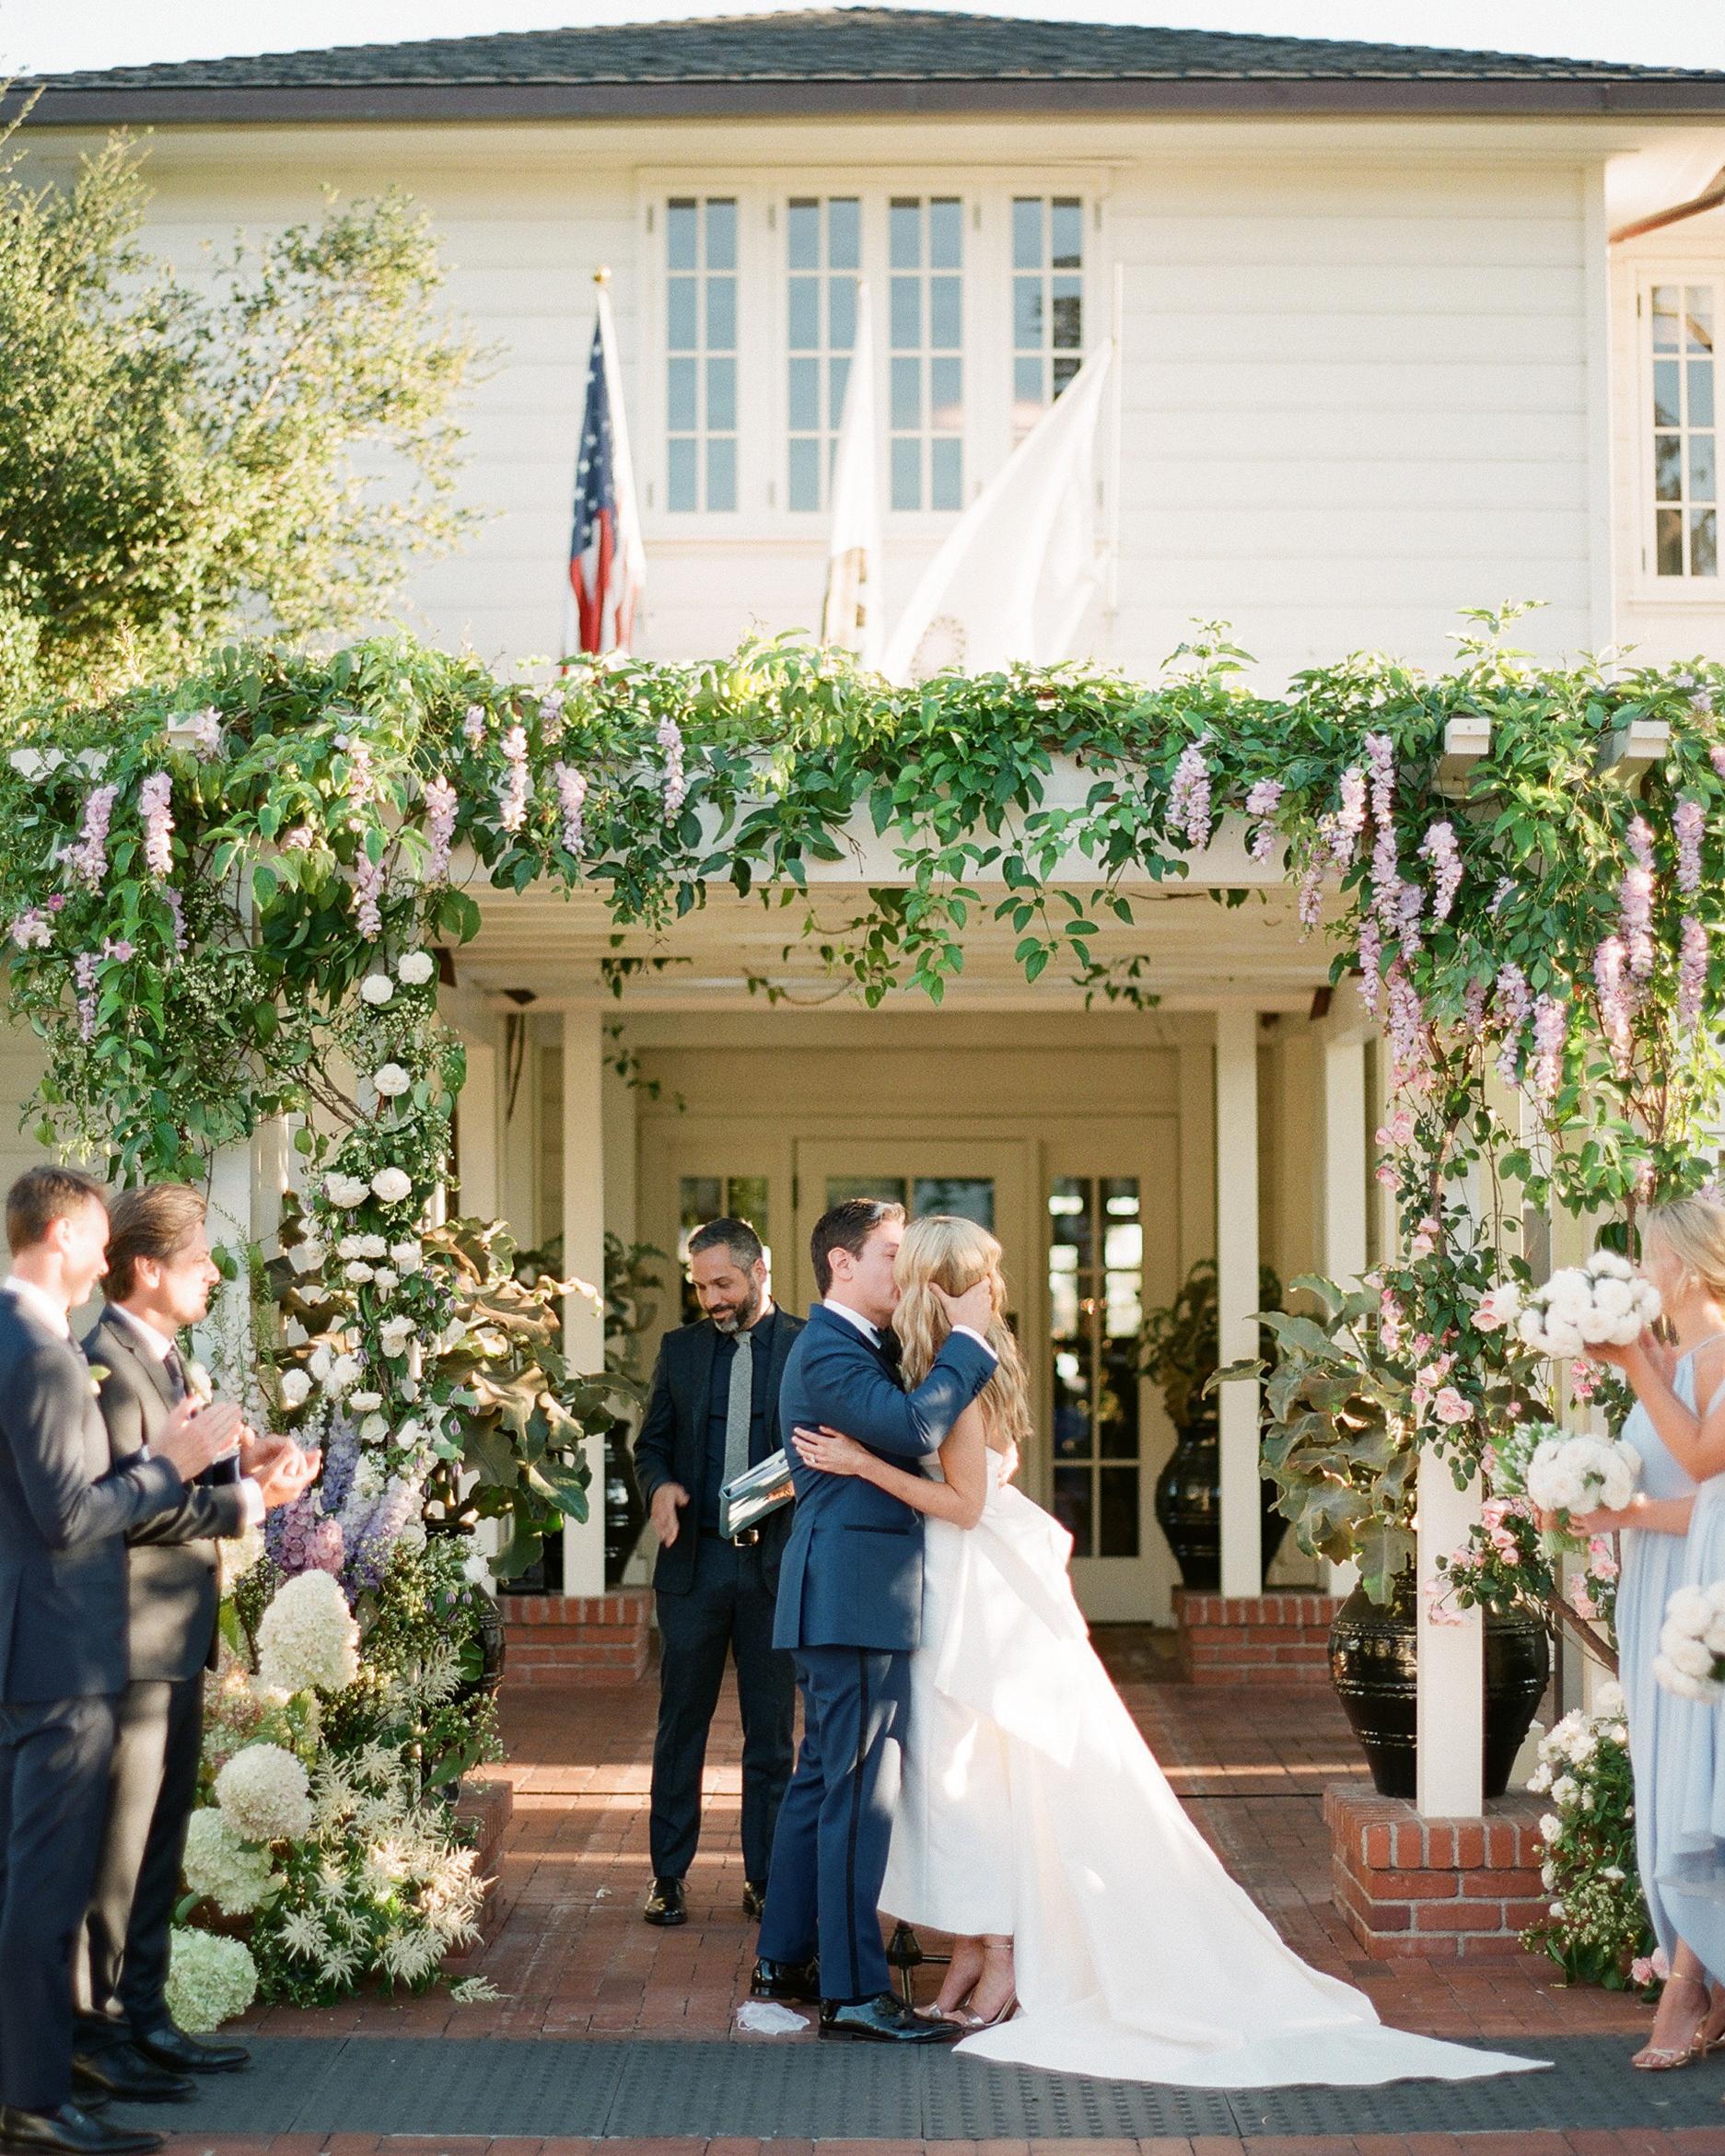 katy michael wedding ceremony kiss